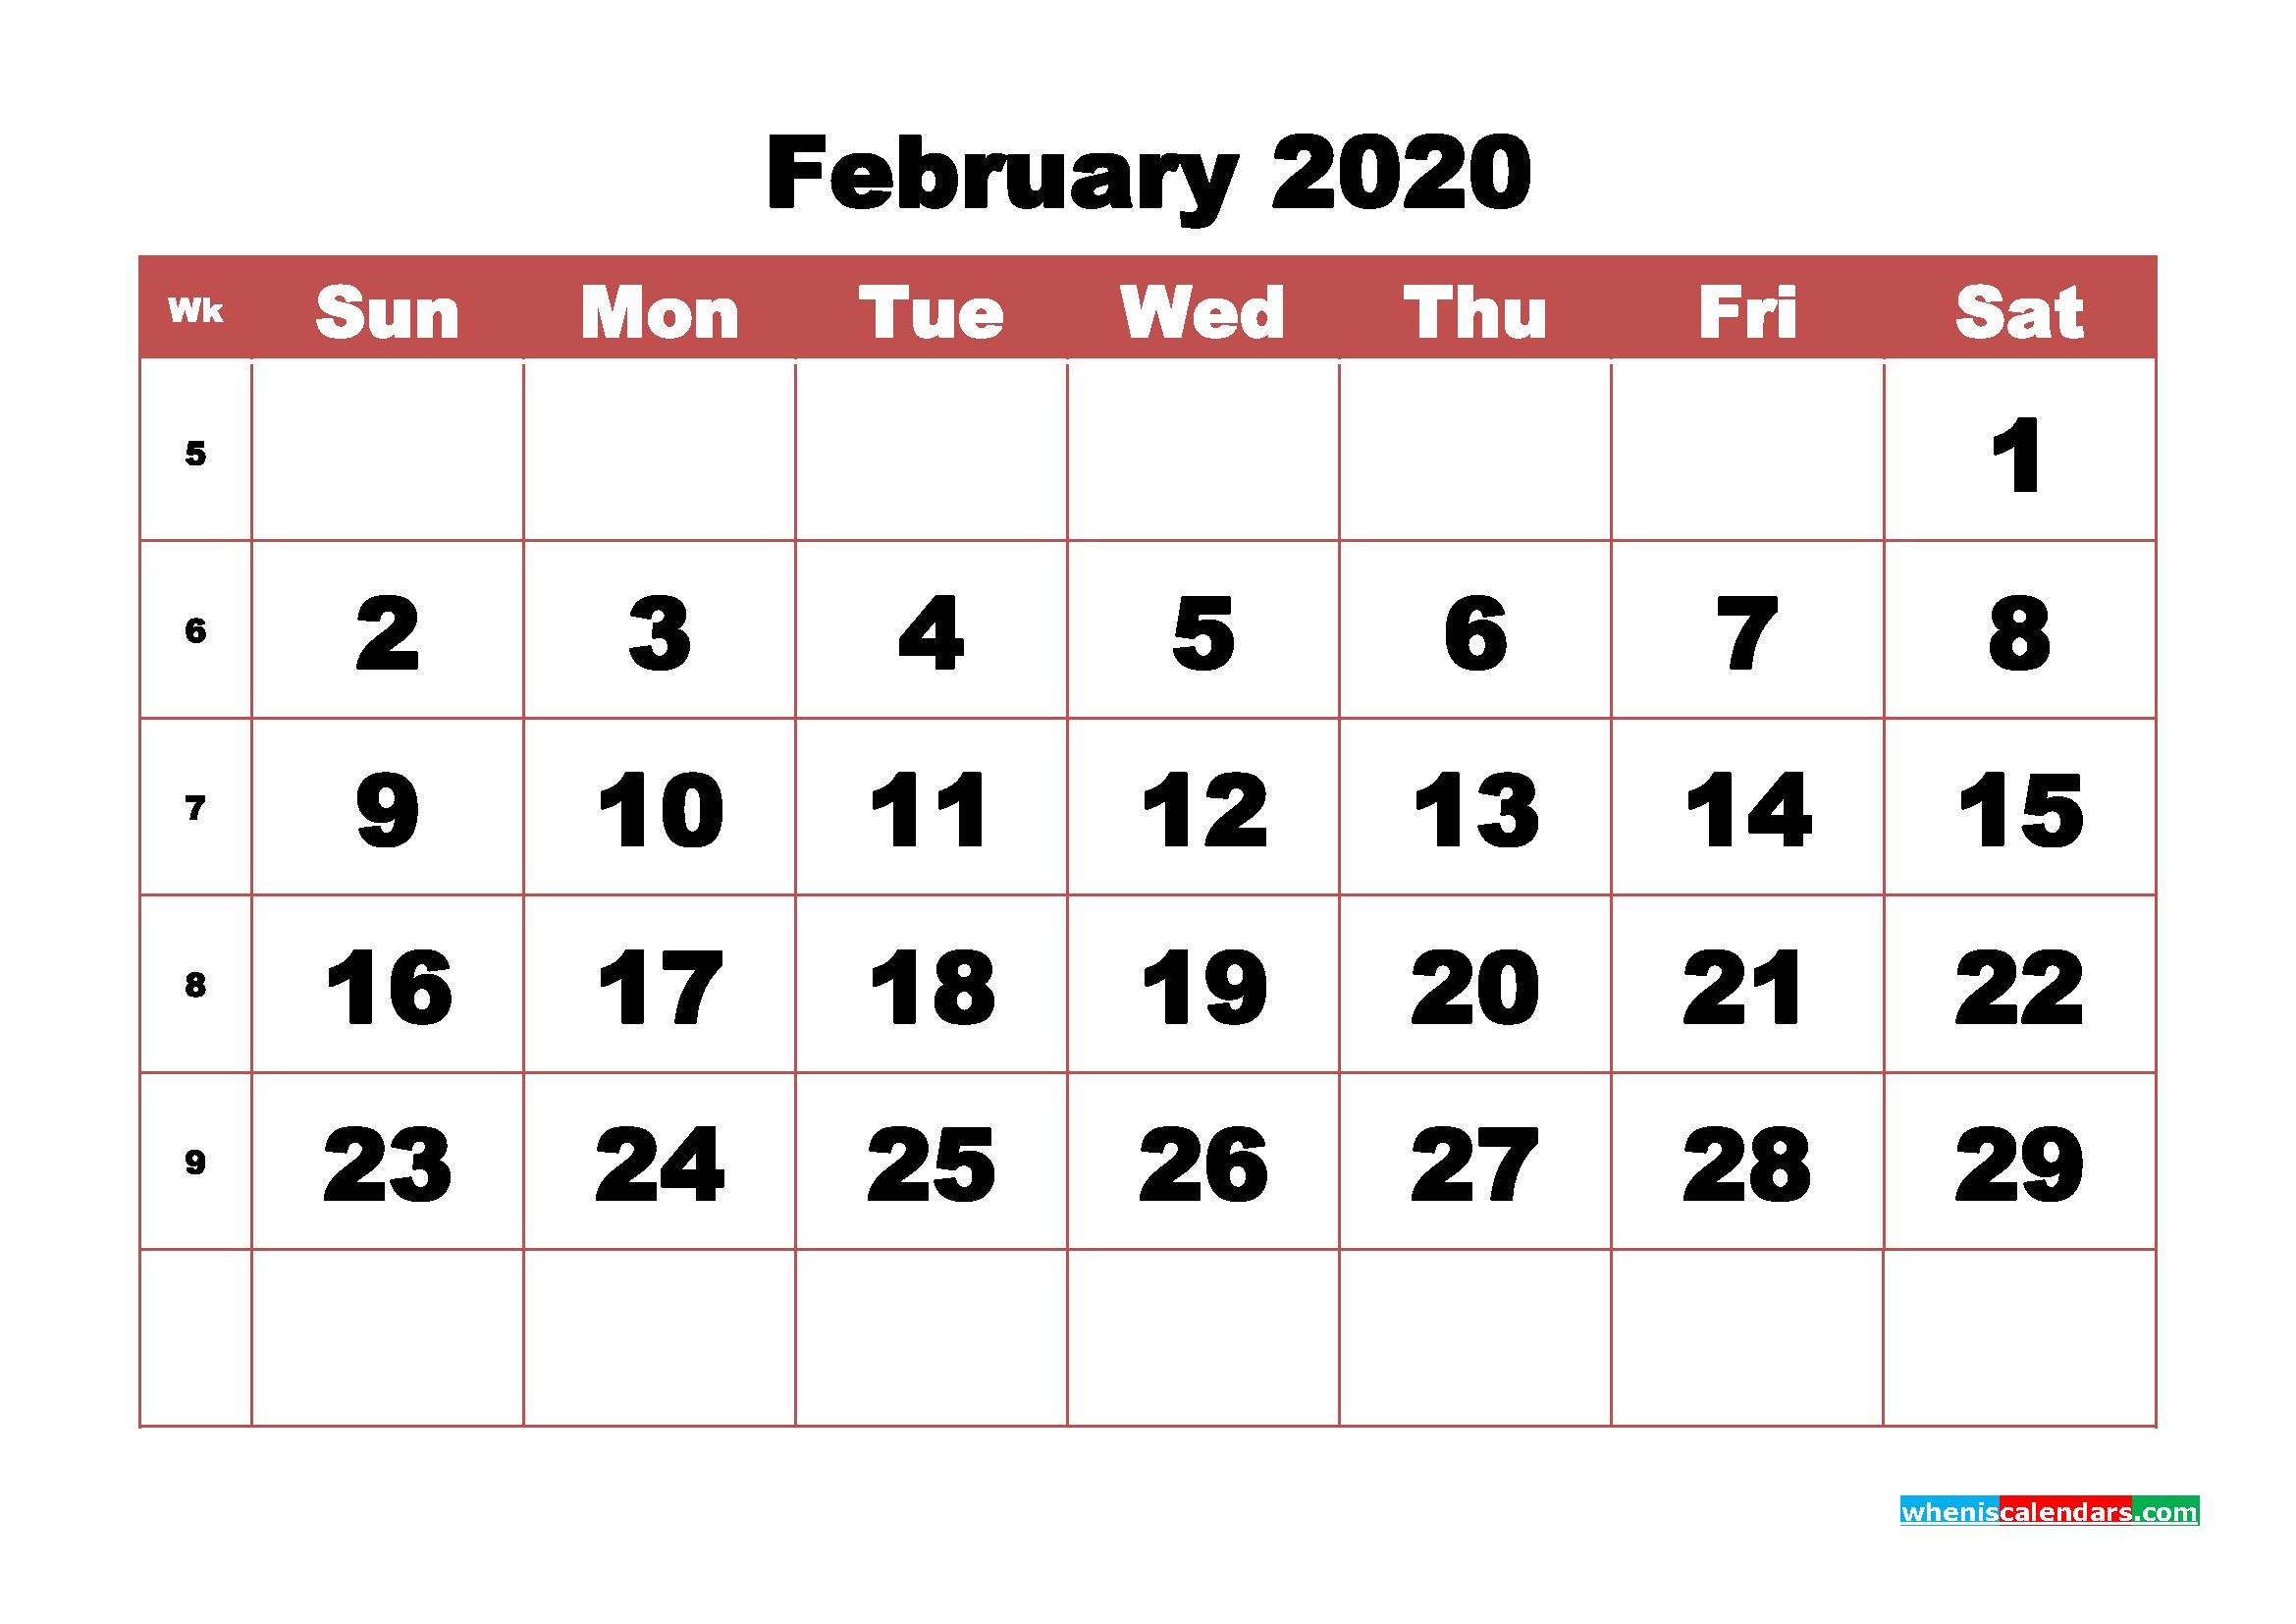 Blank February 2020 Calendar Printable - No.m20b338